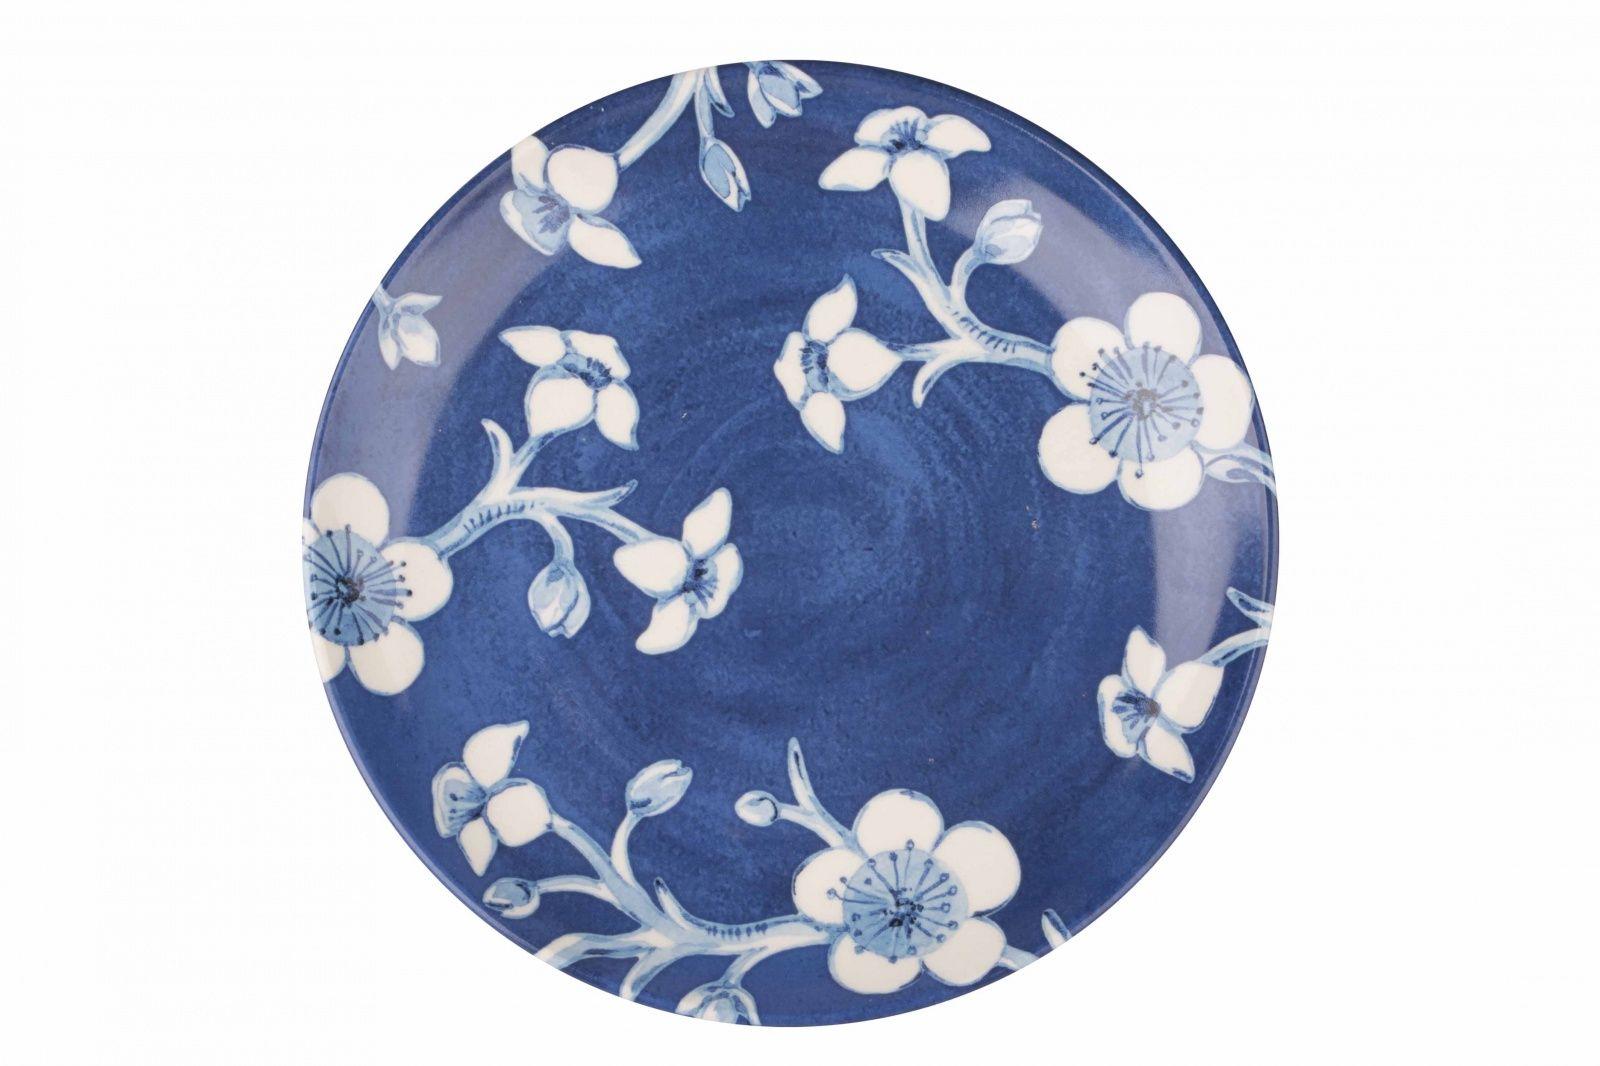 Dulevo porcelain / Plate 210 mm Blue flowers (Ceramics)